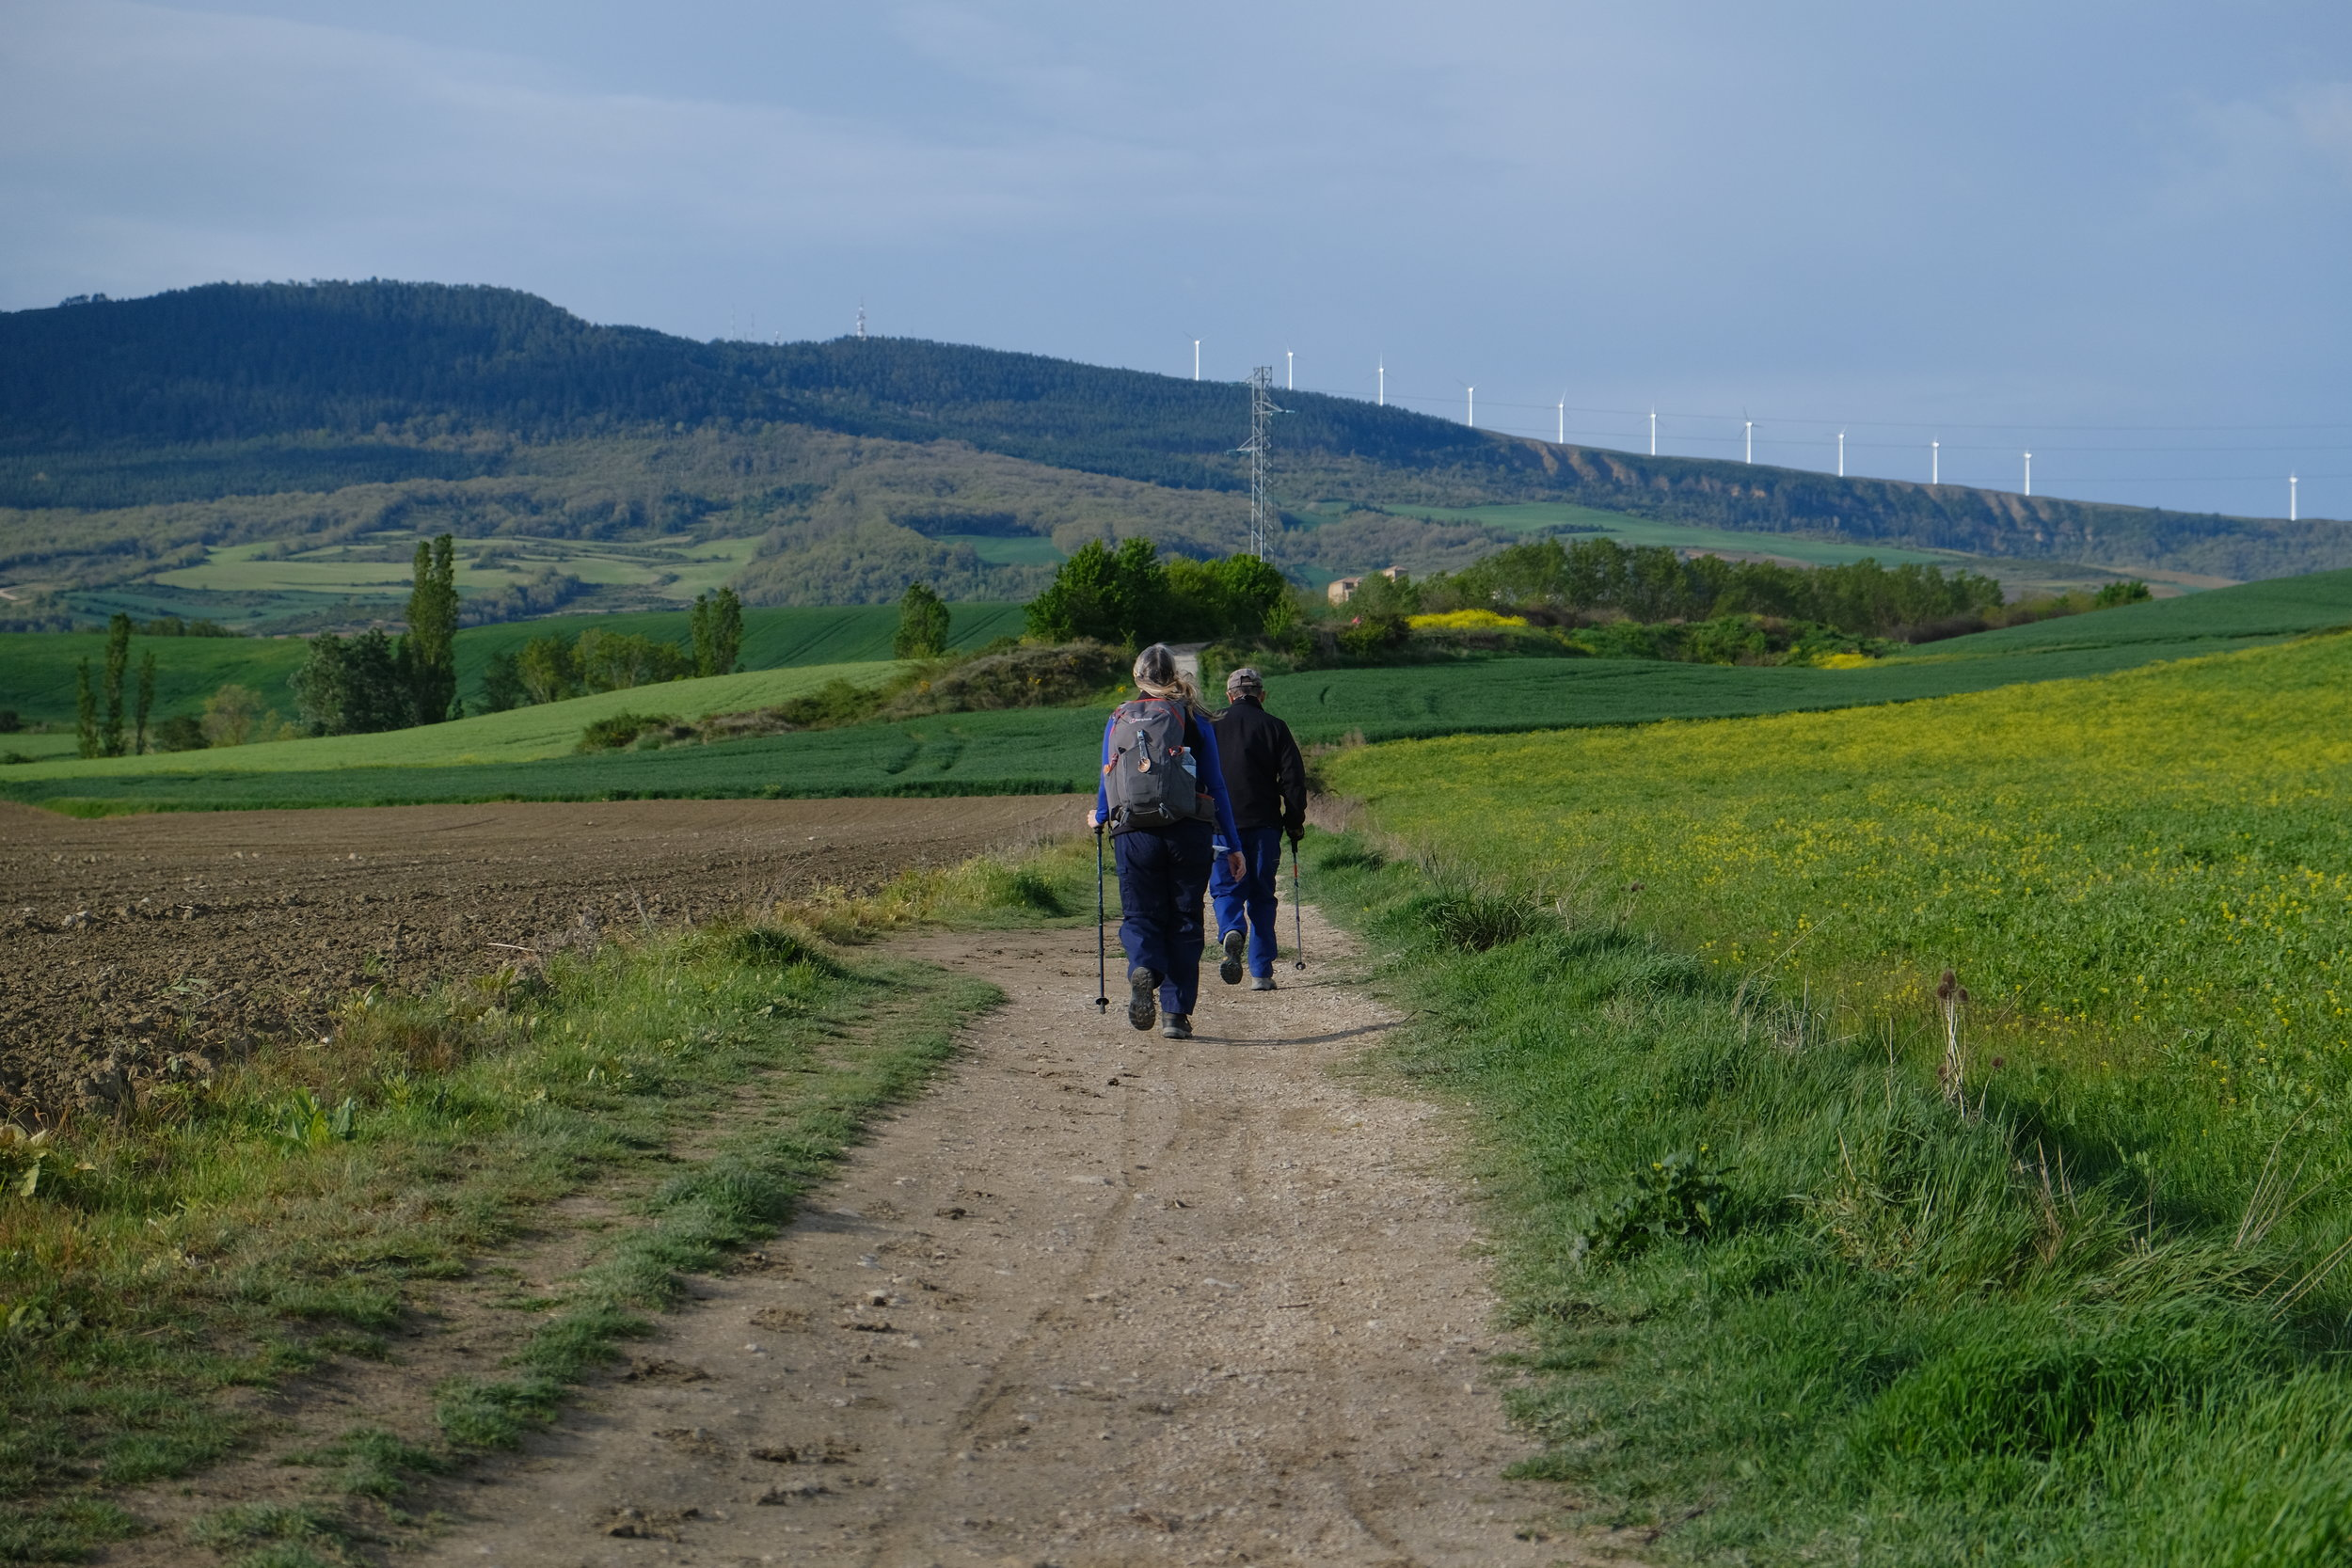 Crossing the windy ridge outside of Pamplona